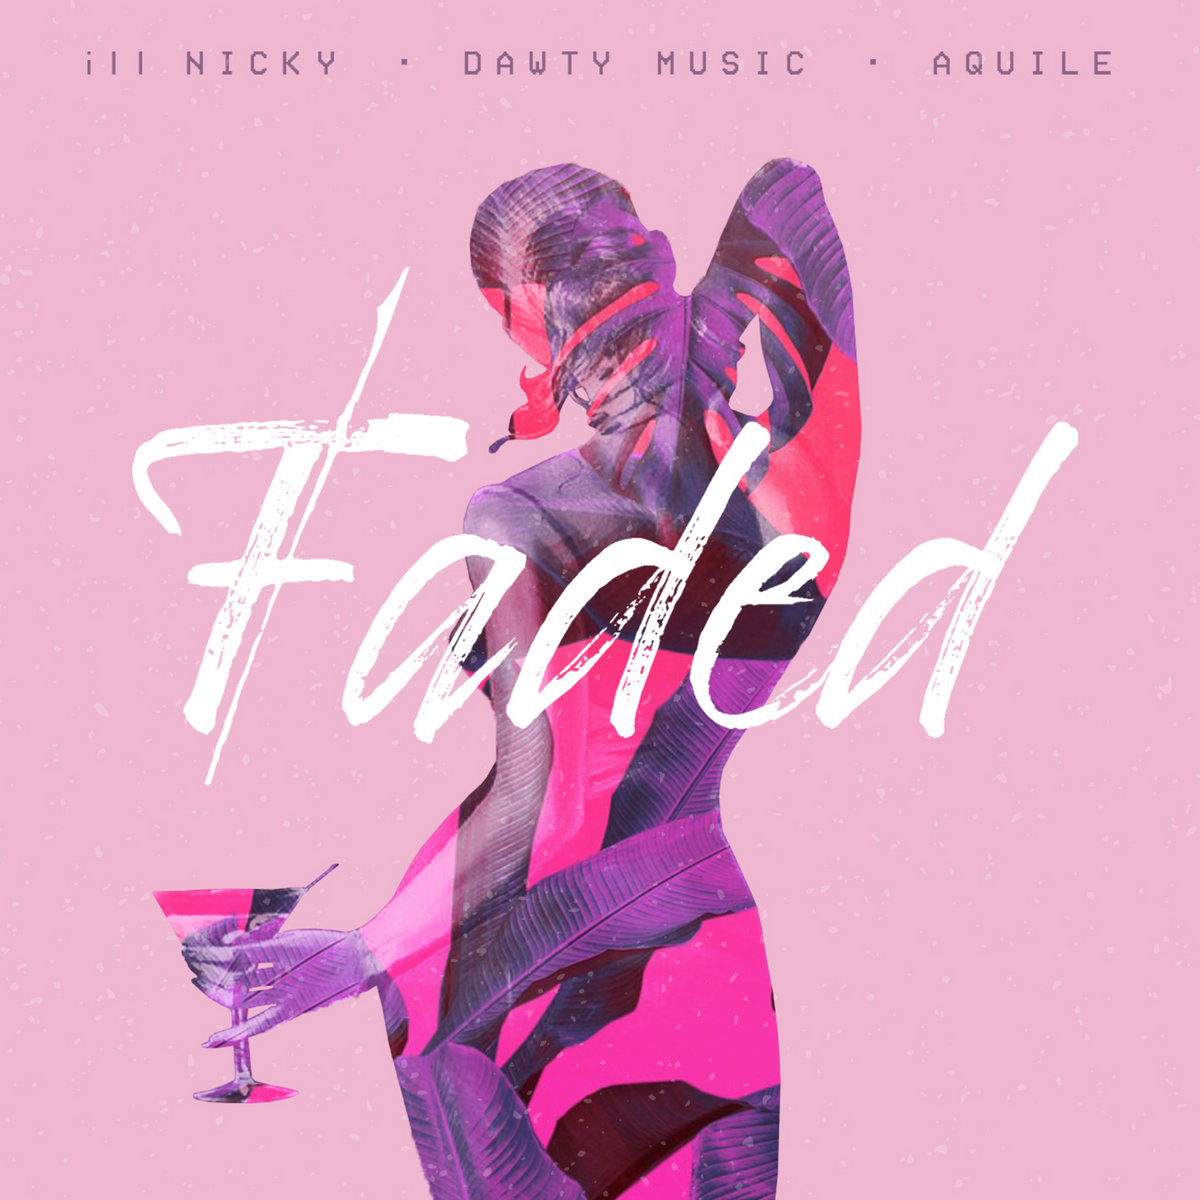 Faded | ill Nicky